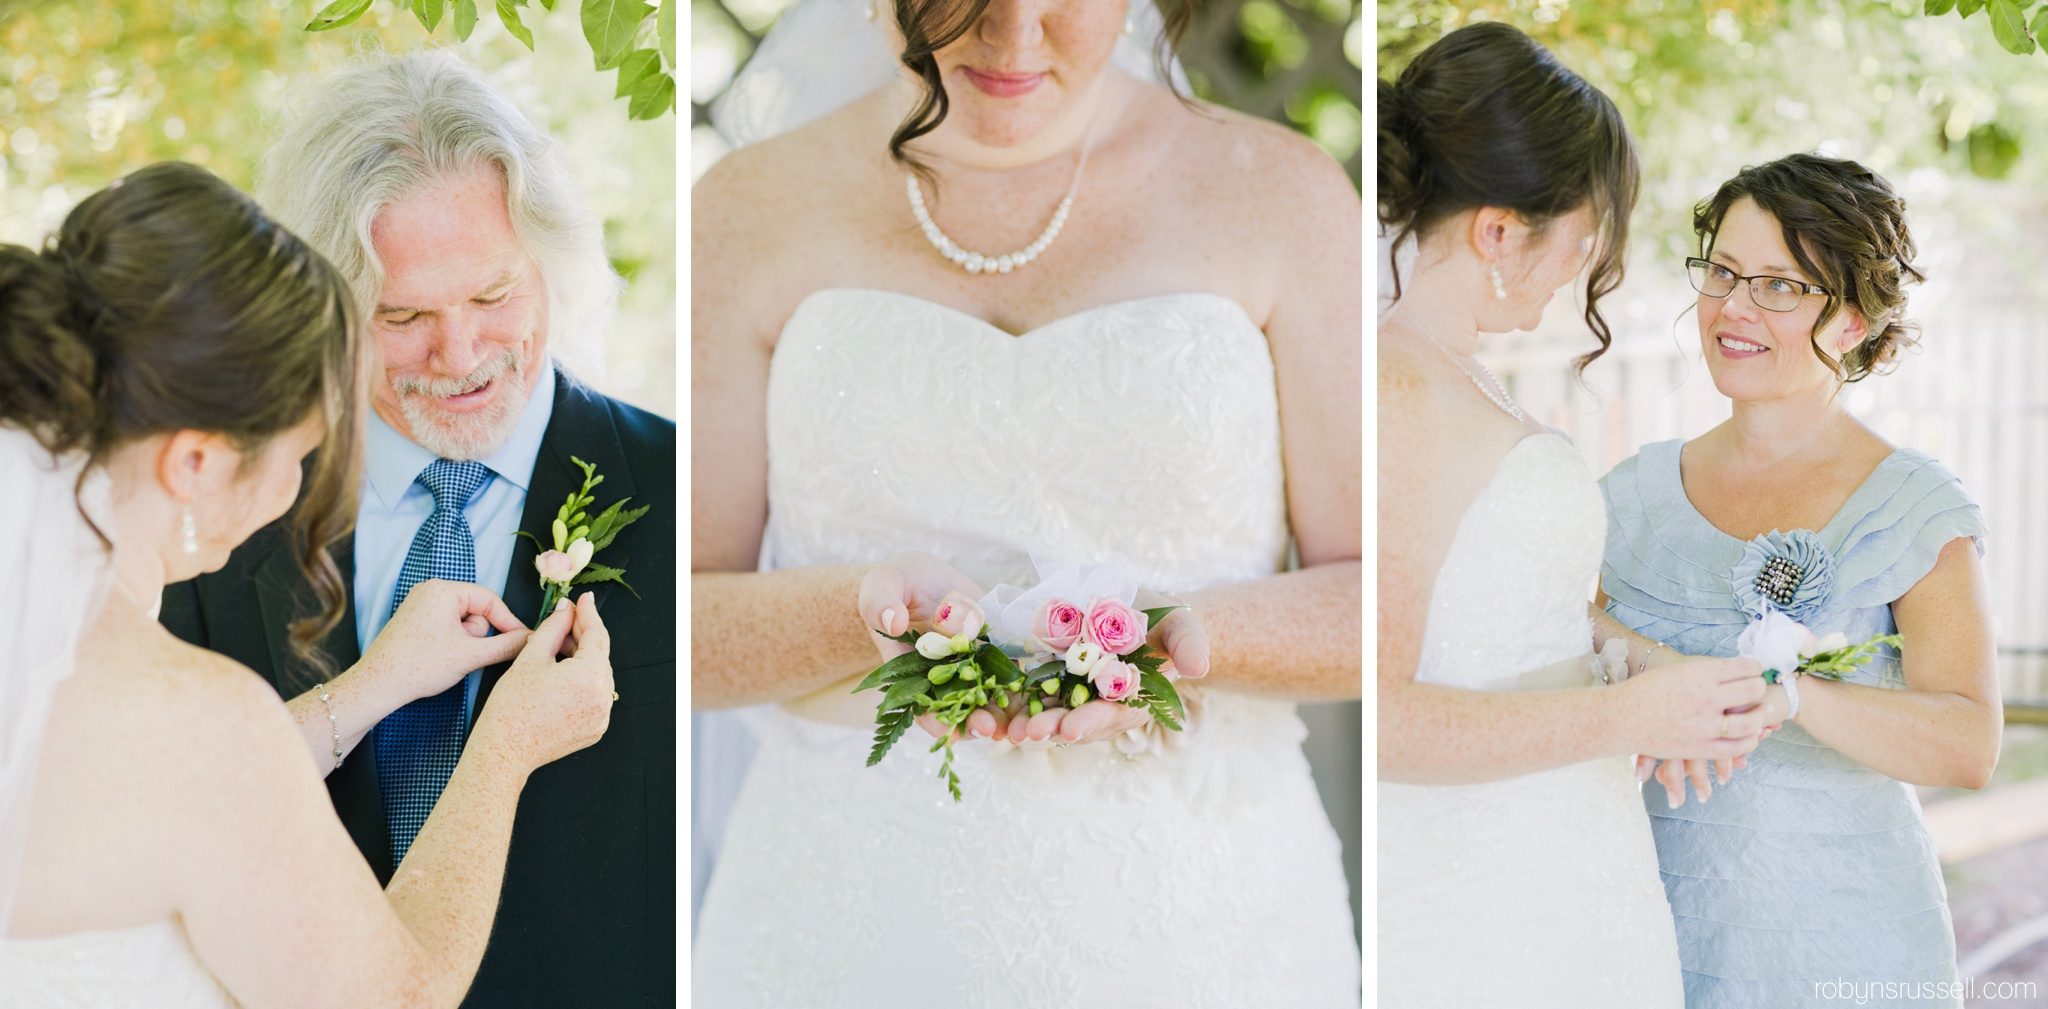 7-summer-wedding-details-burlington-wedding-photographer.jpg